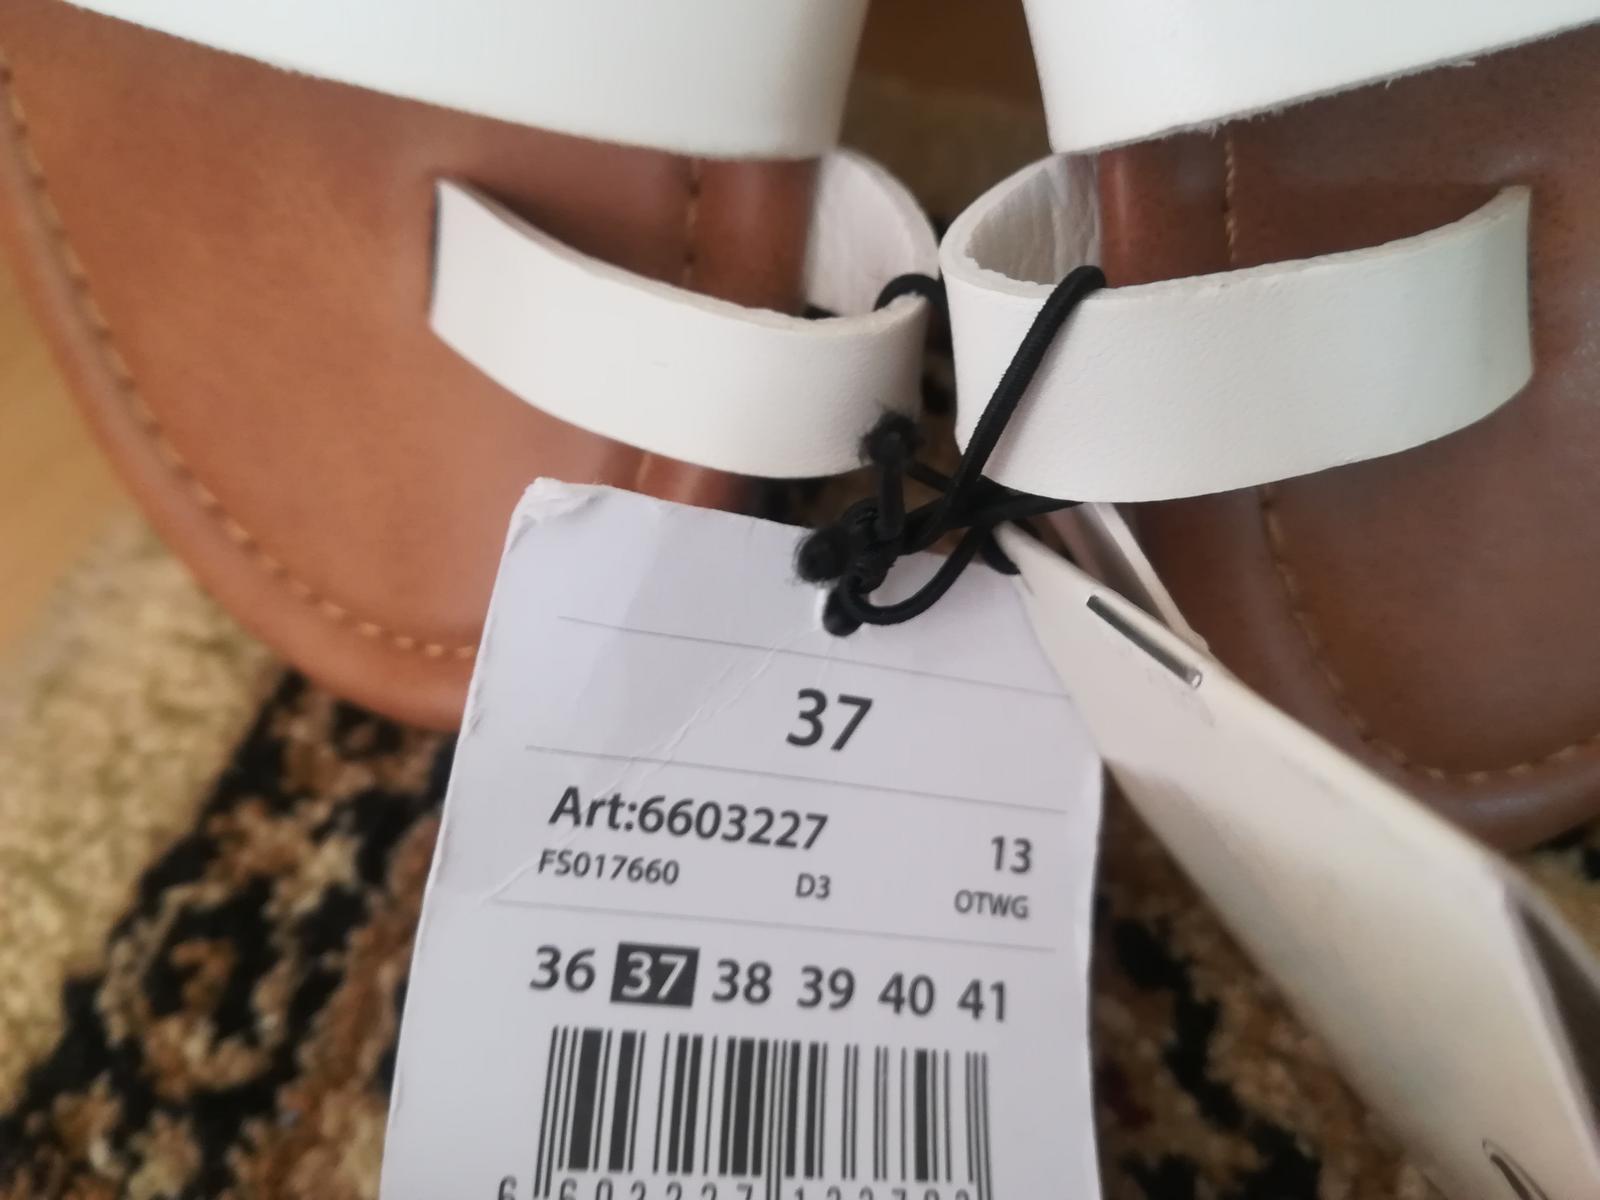 Sandálky  - Obrázek č. 3